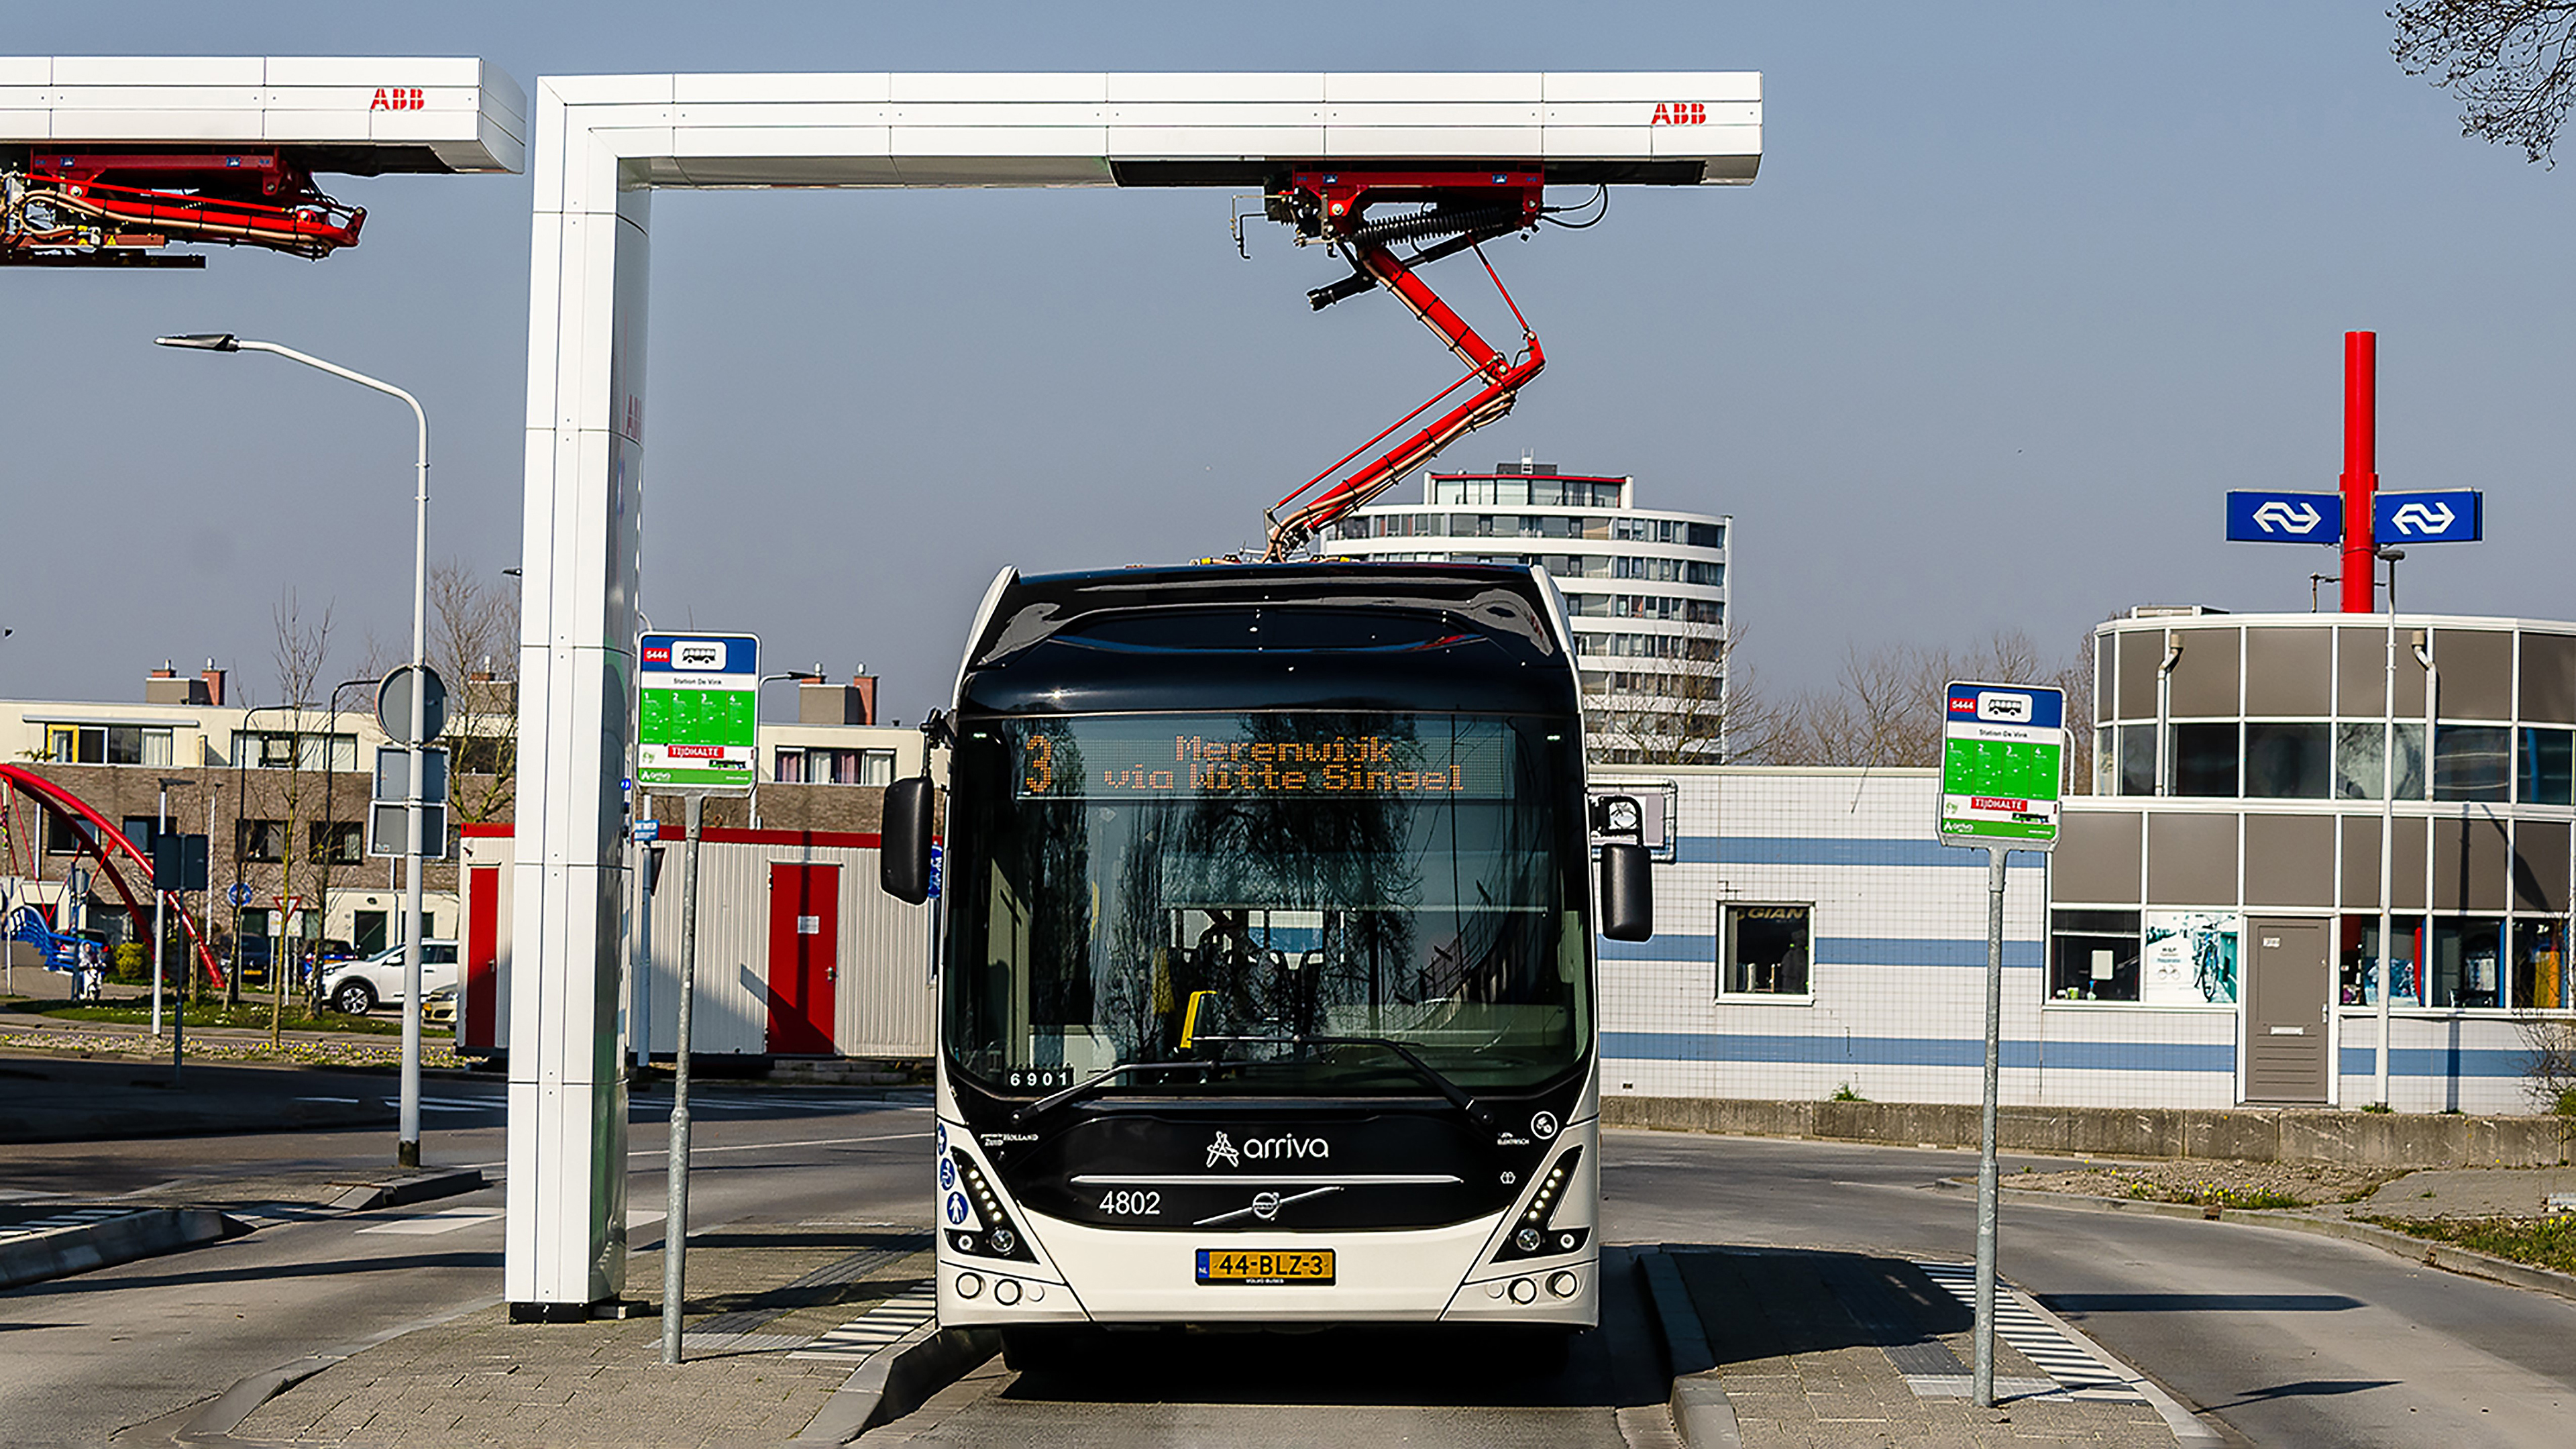 Laadstation bij Station de Vink Leiden